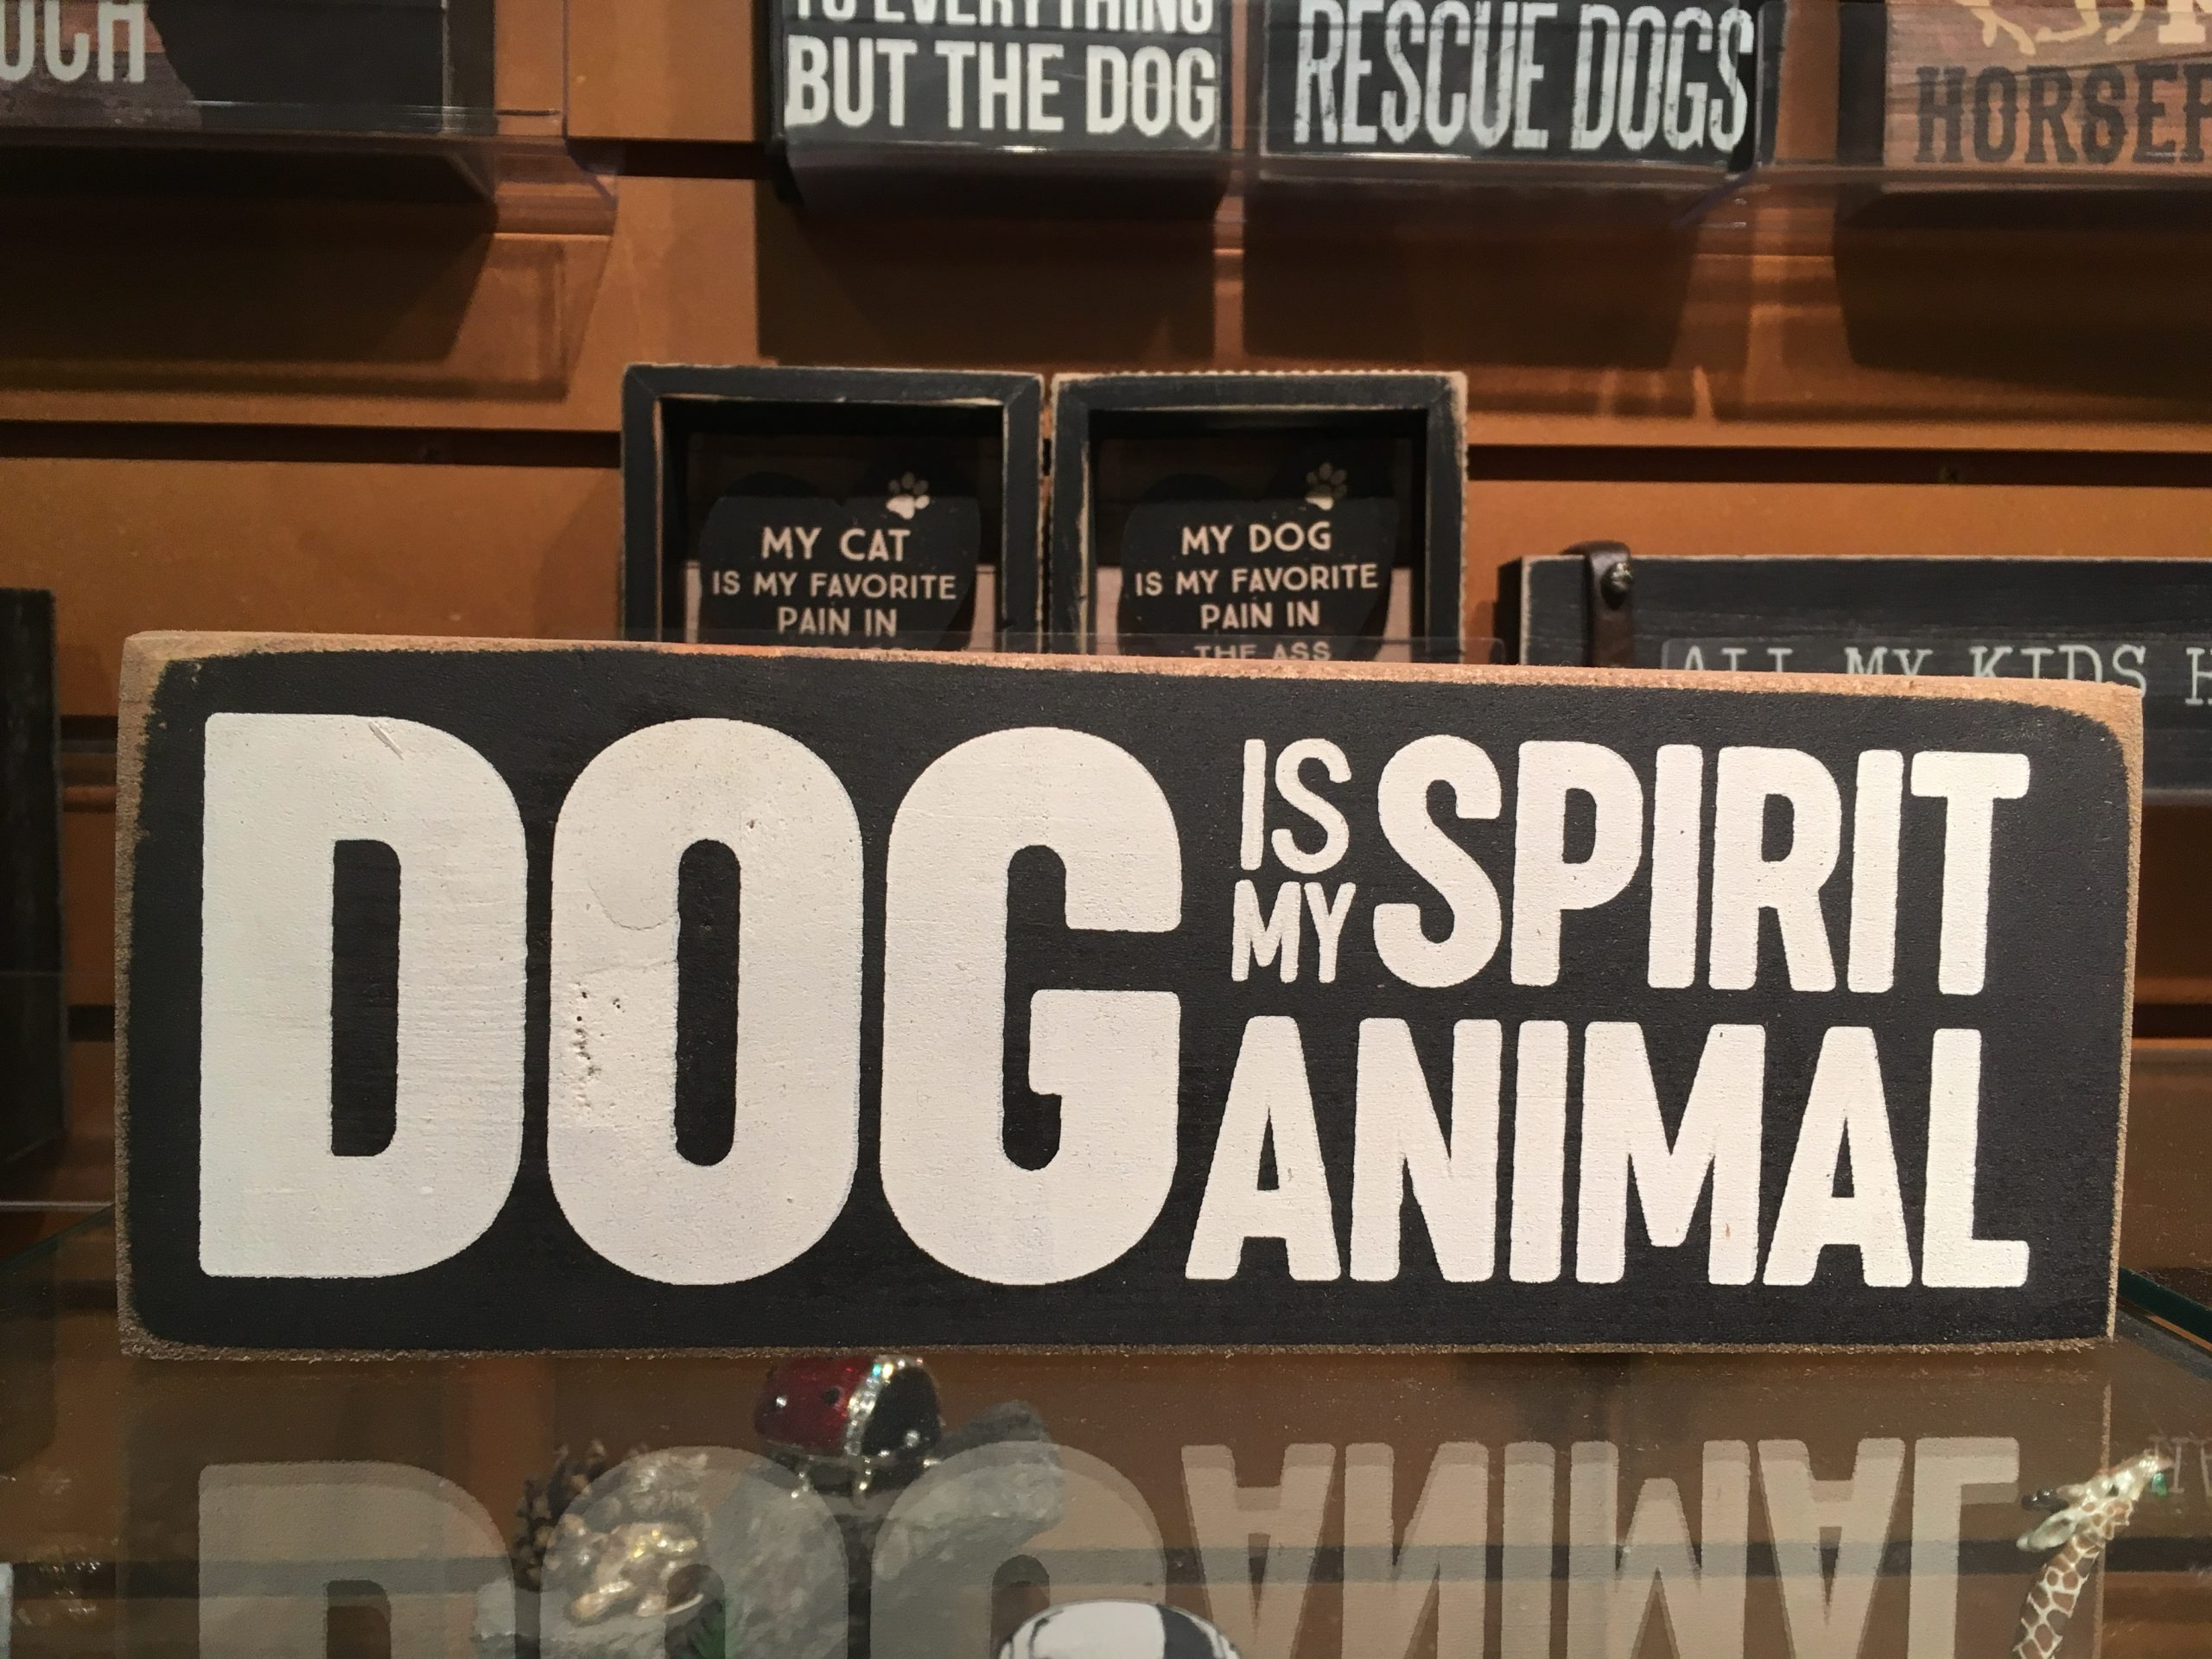 Hundeartikel